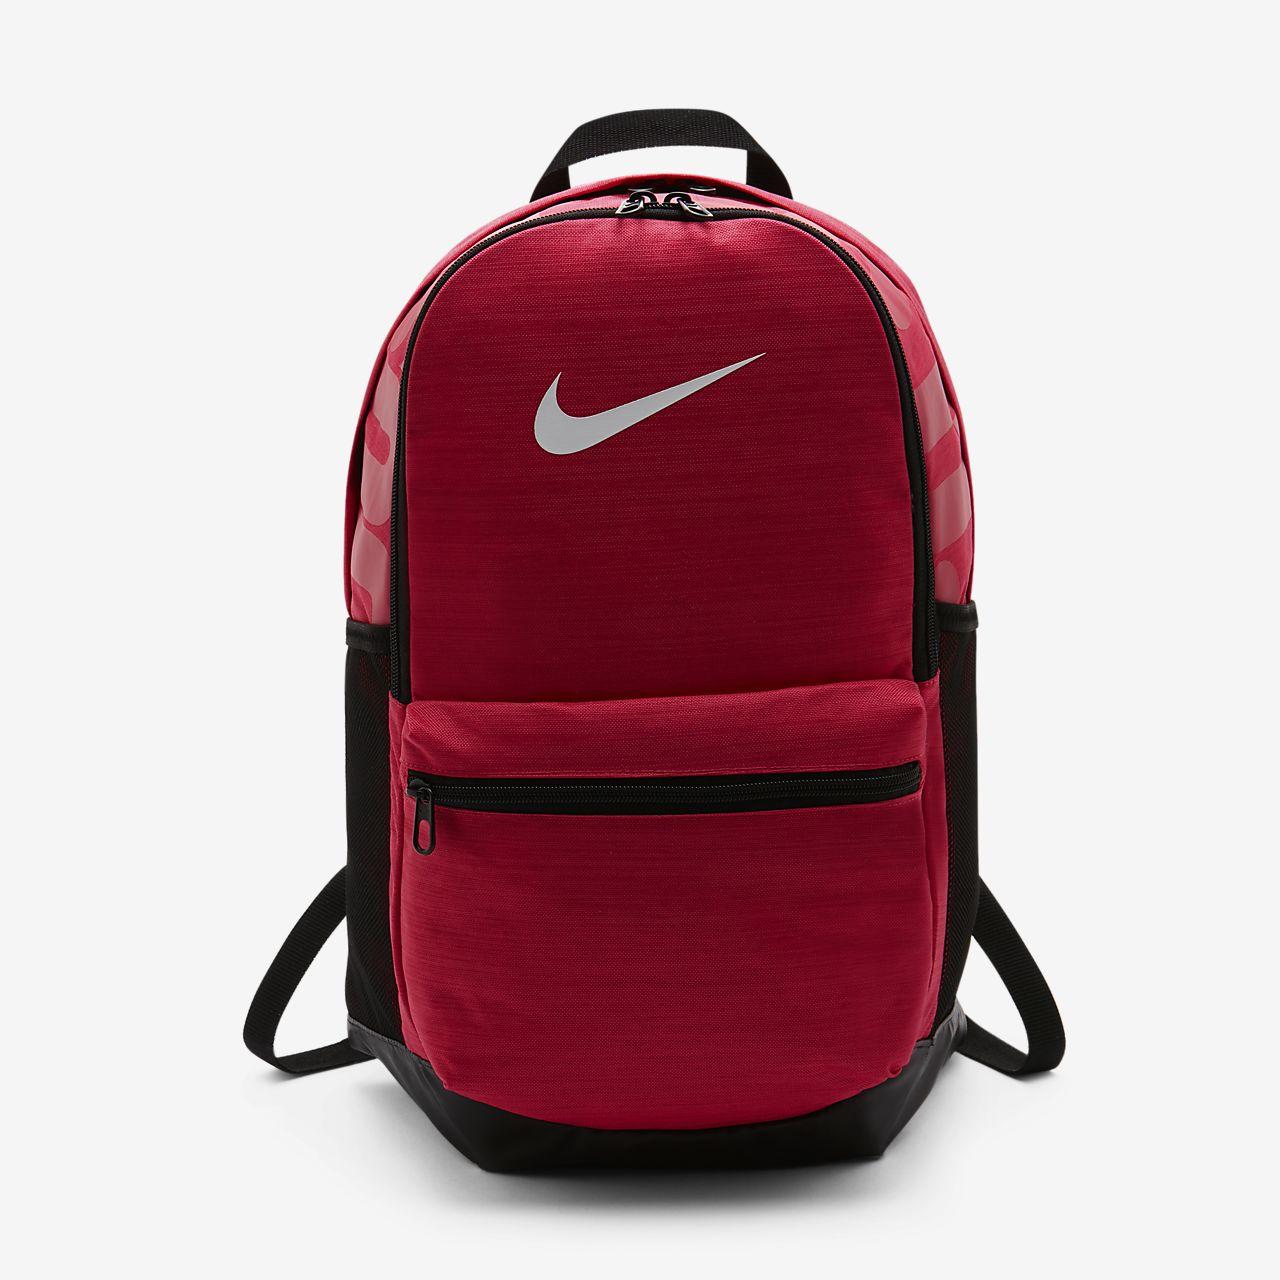 cbbb8f5f191 Nike Brasilia (Medium) Training Backpack. Nike.com CA